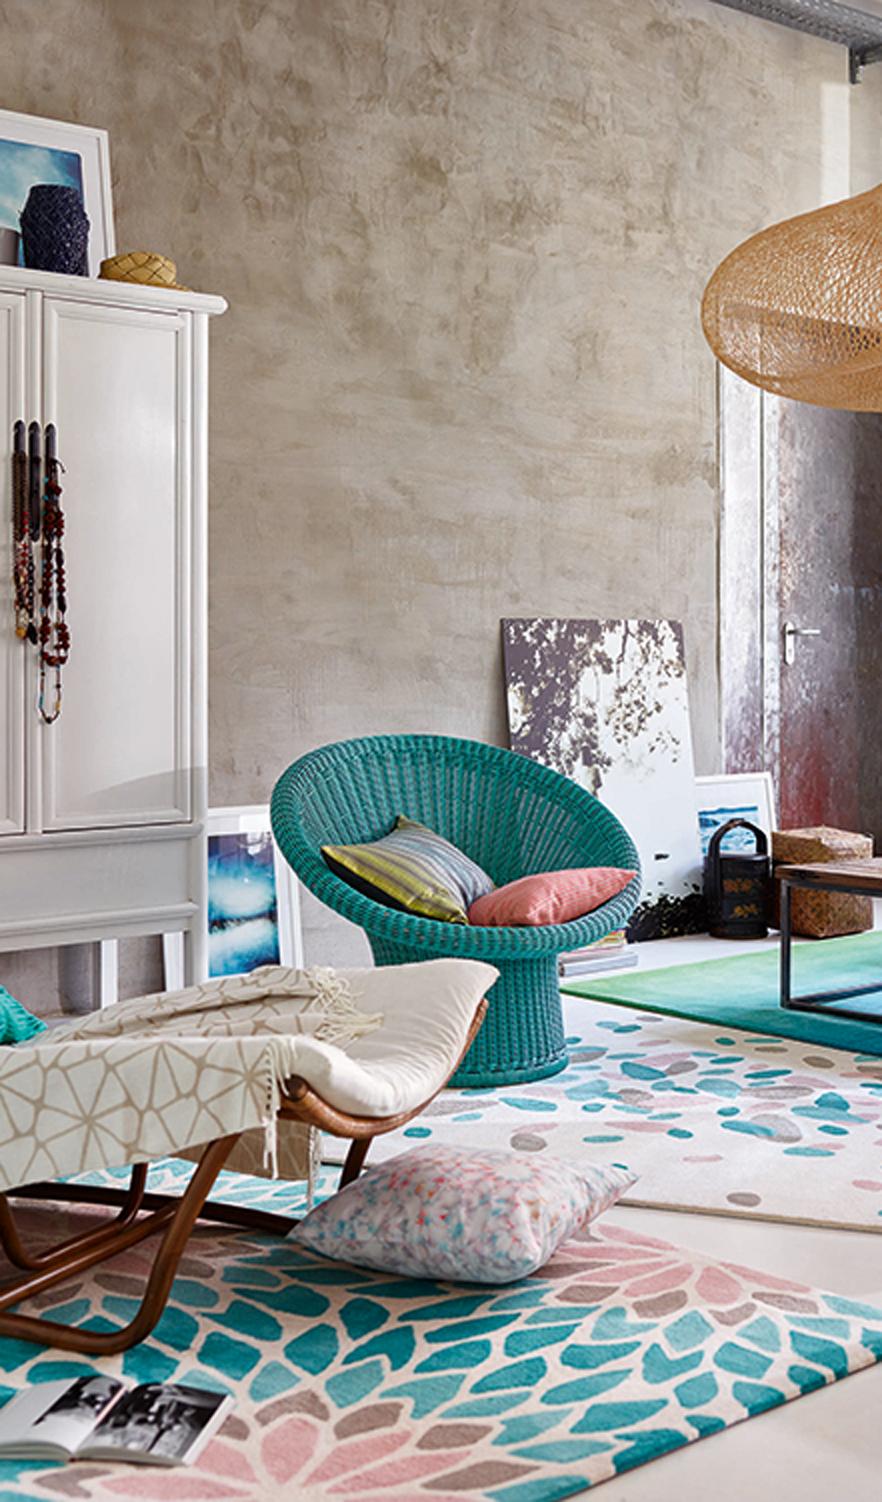 Pastel rug with brush stroke petal design